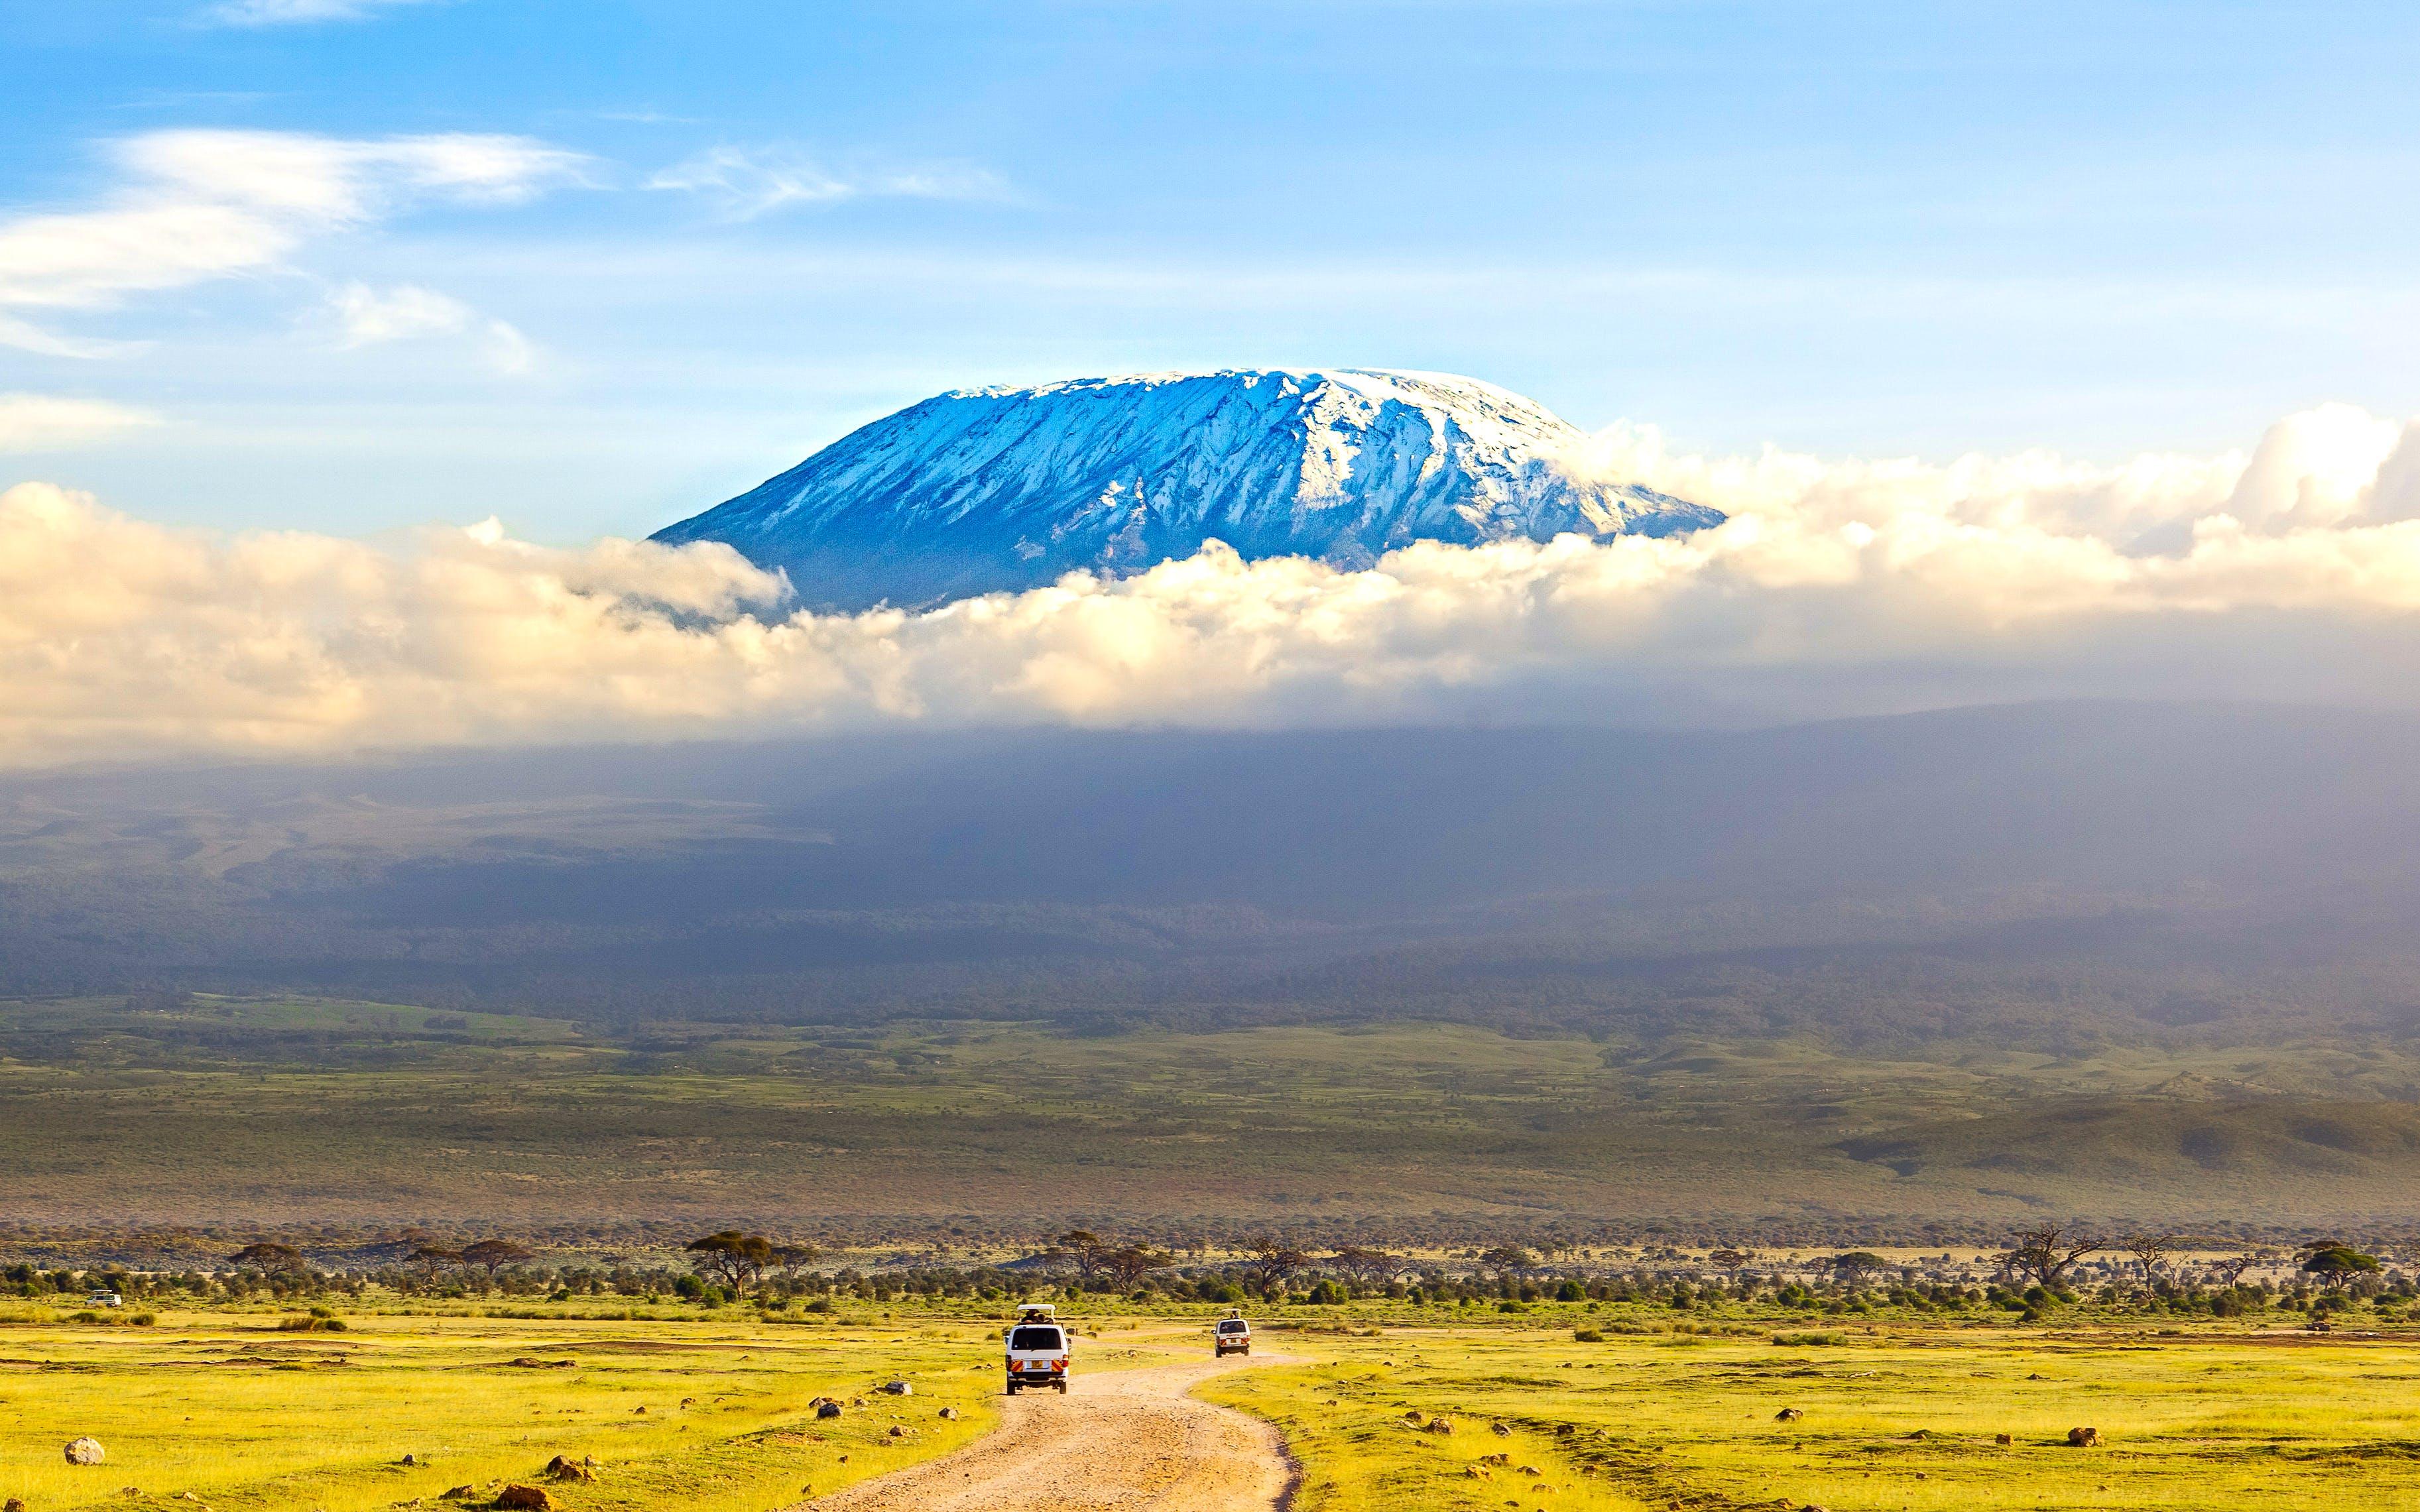 Kilimanjaro - Machame Route (5,895m)